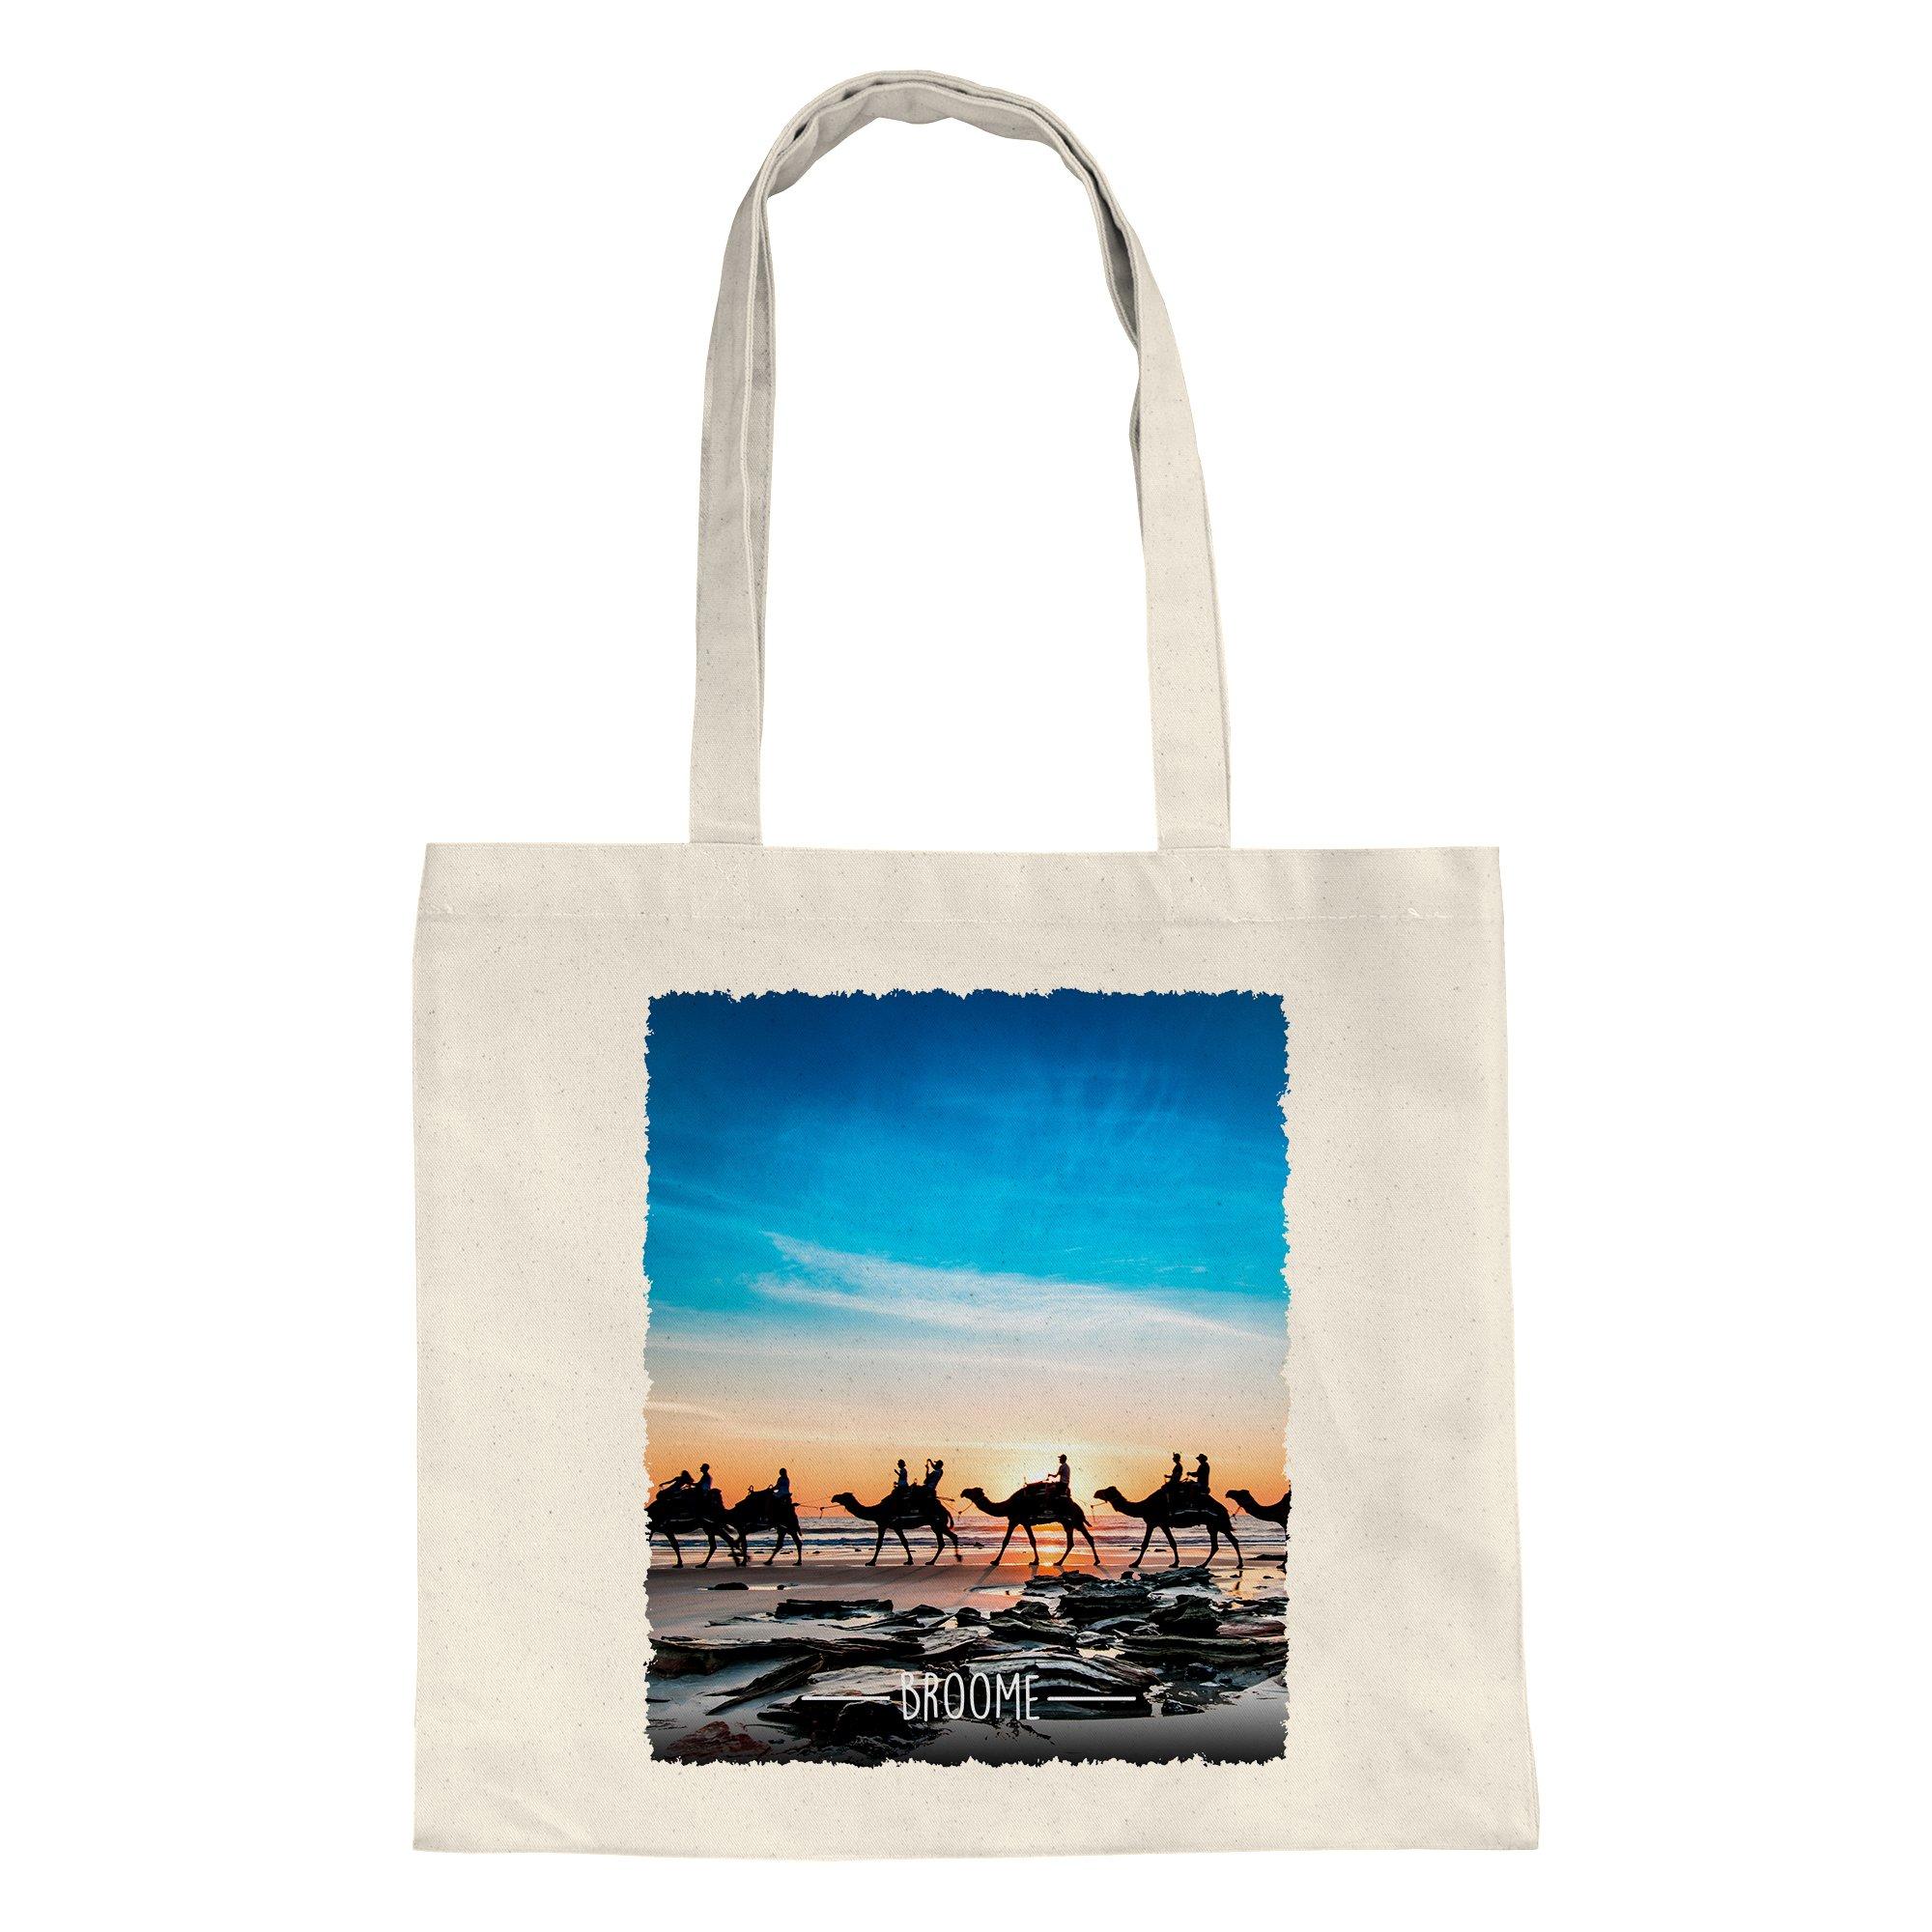 broome-camels-tote-bag-western-australia